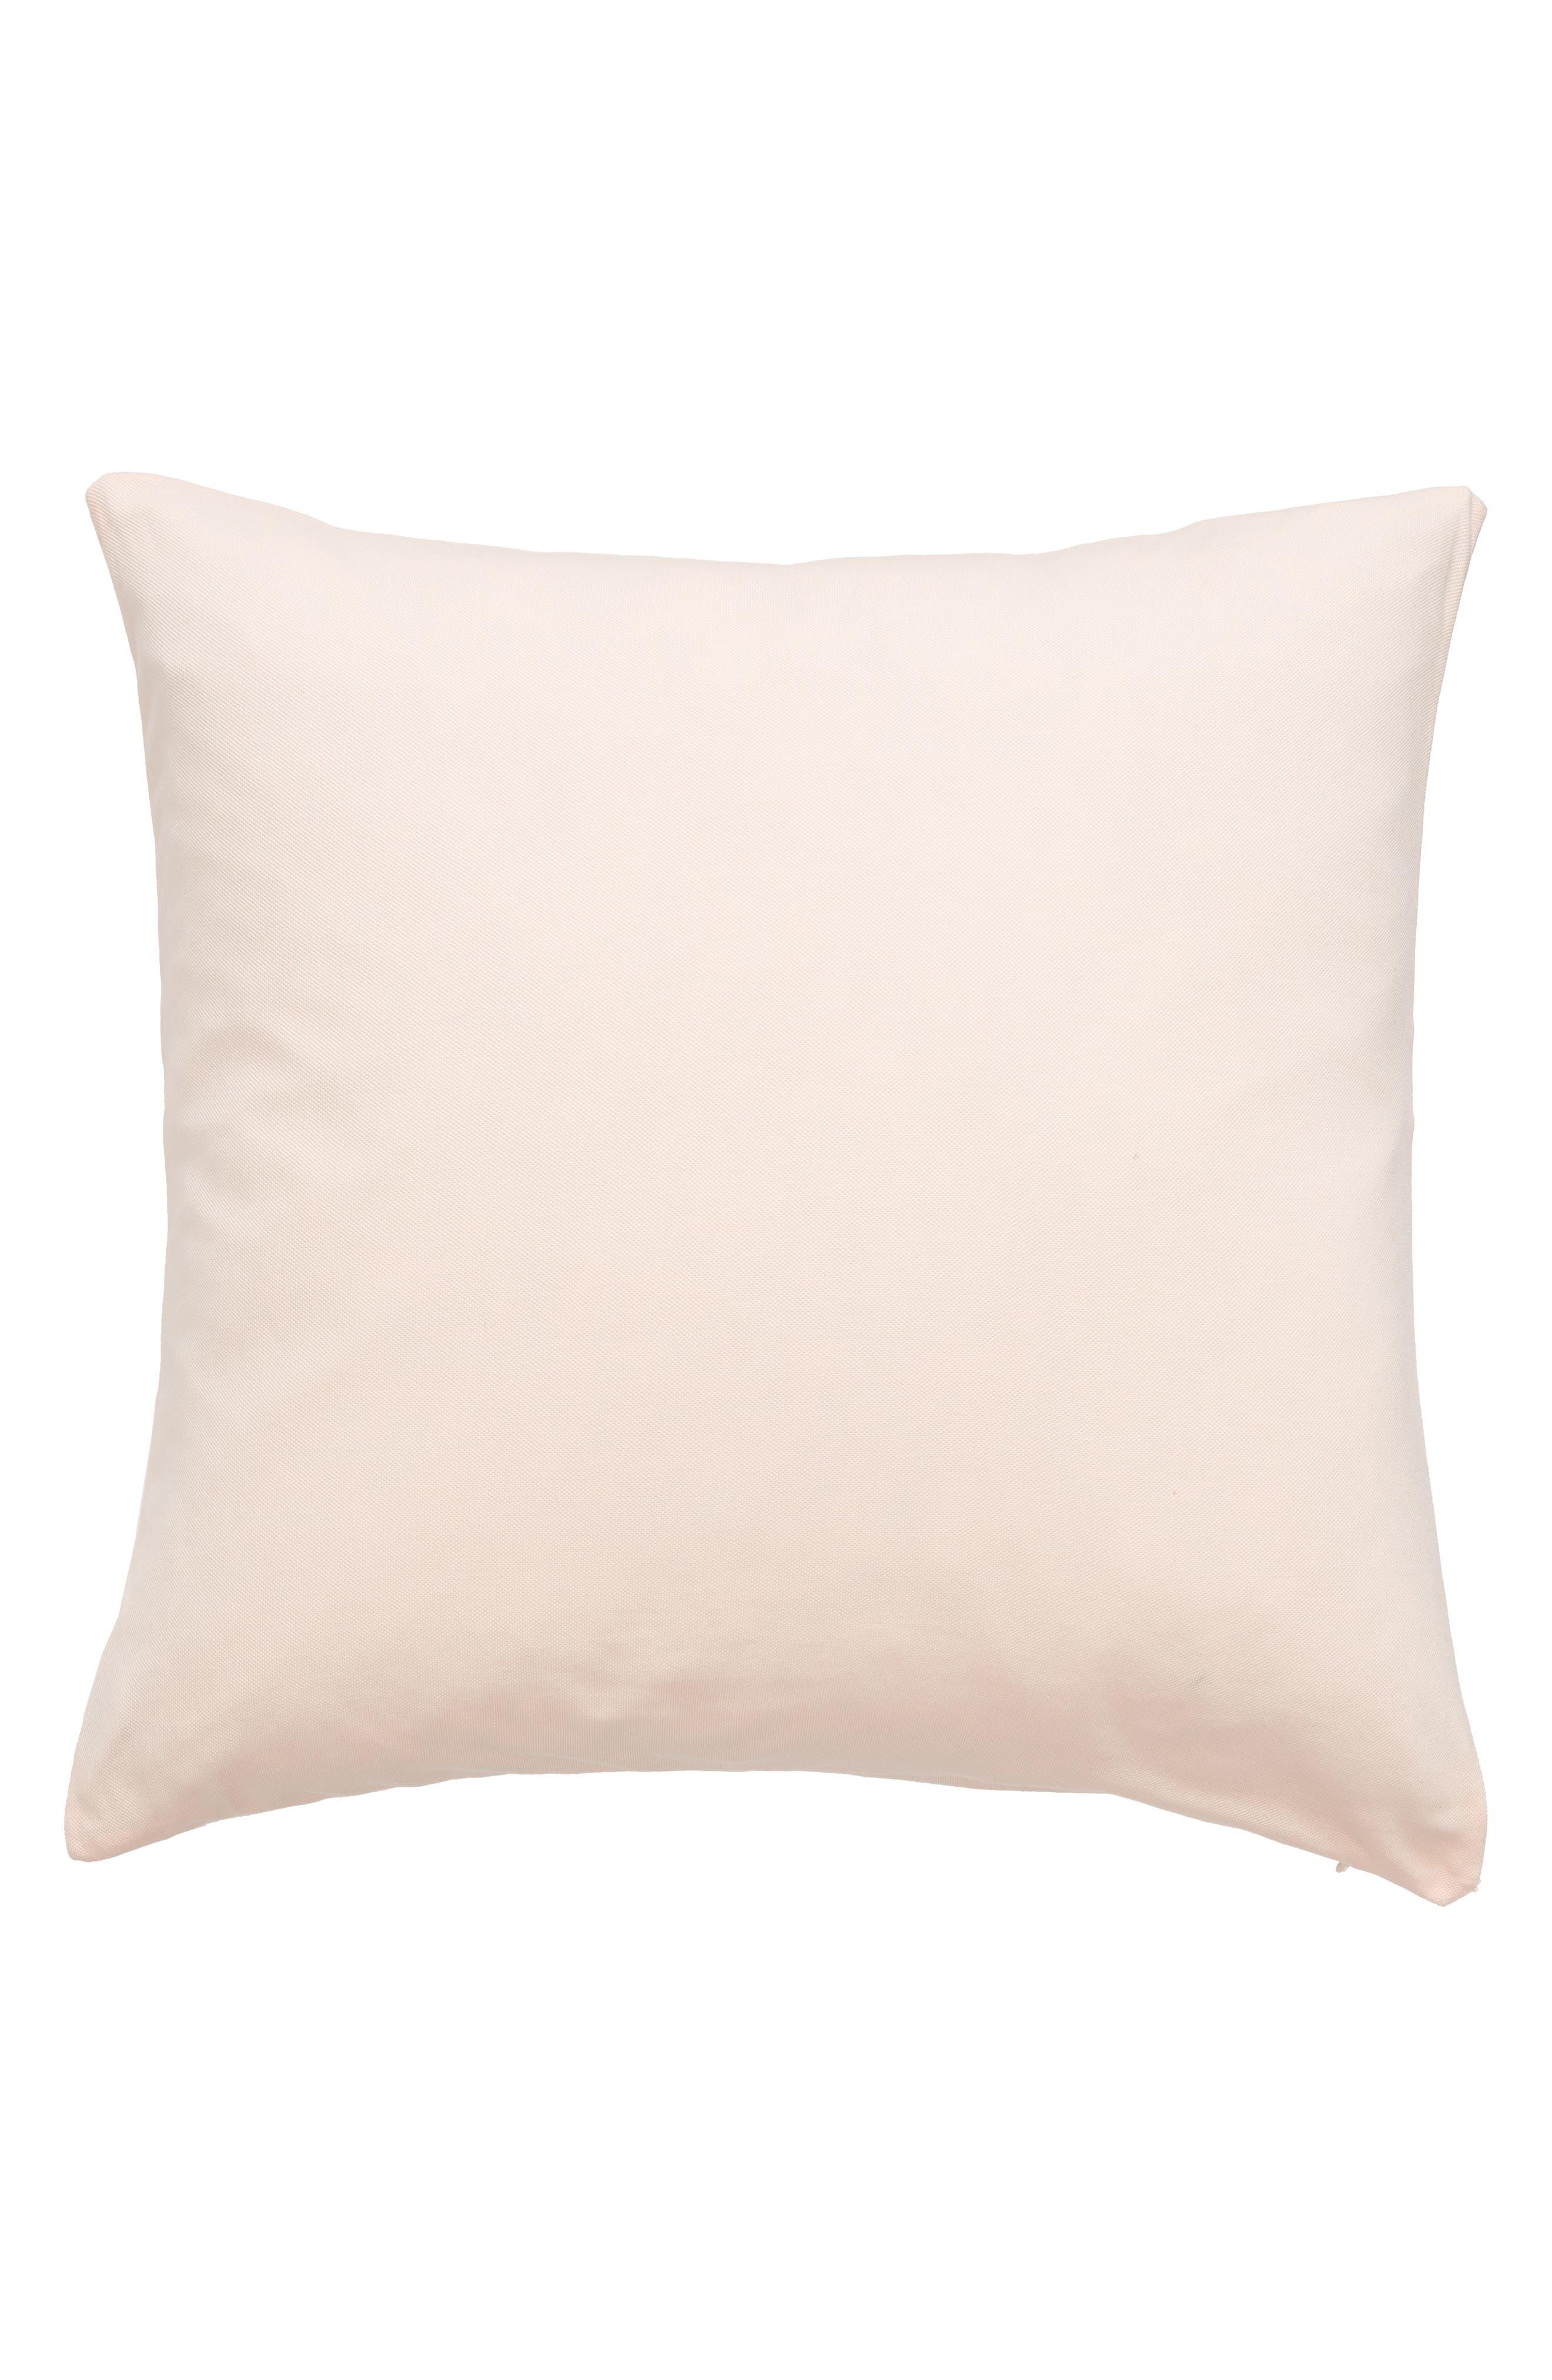 Home Jacob Accent Pillow,                         Main,                         color, 650